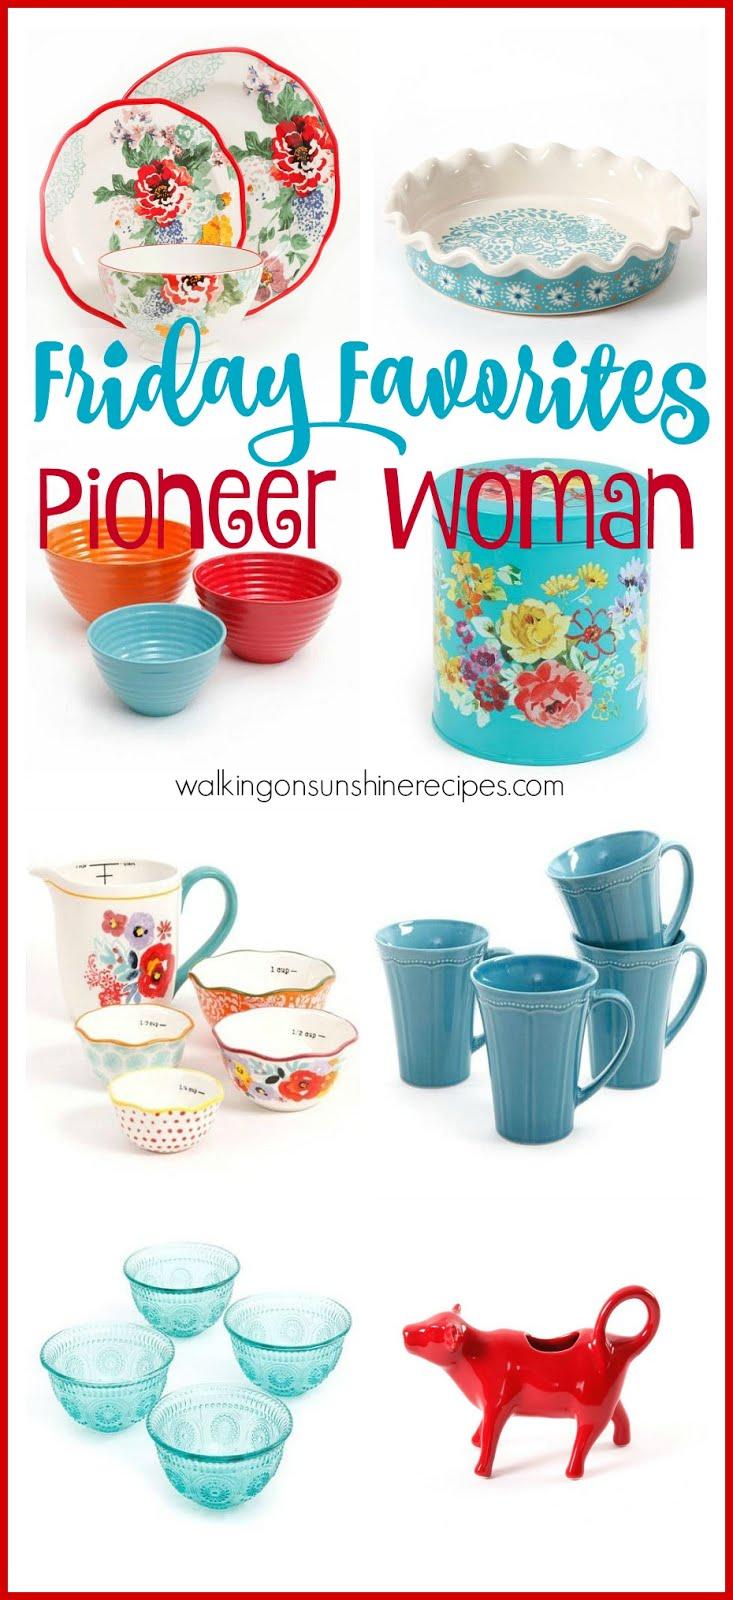 Pioneer Woman Wish List